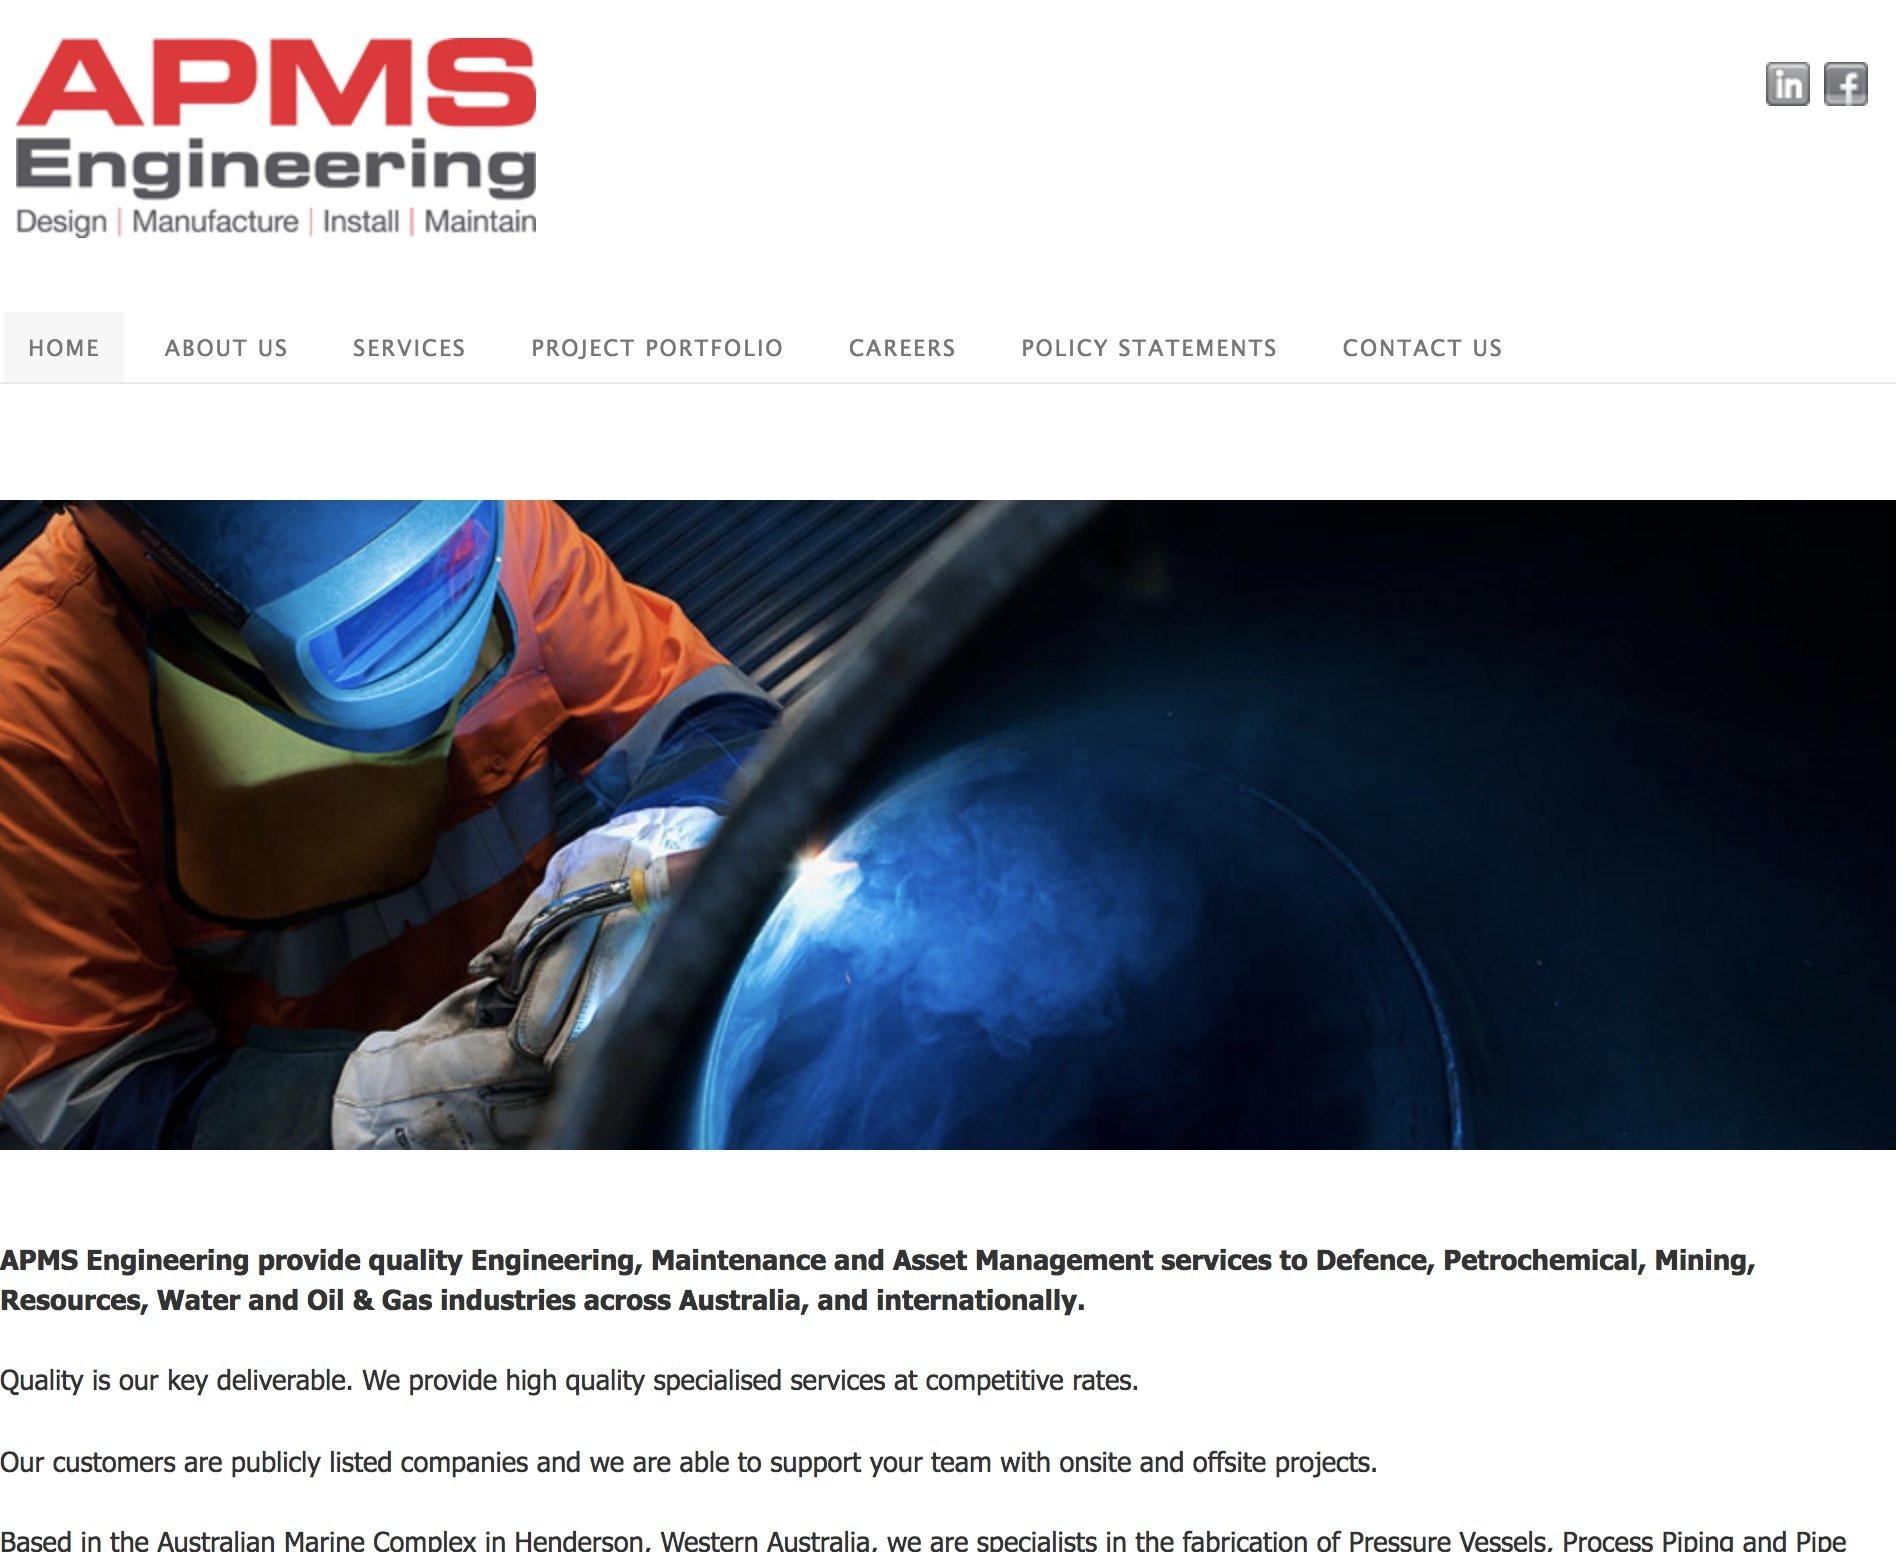 APMS Engineering